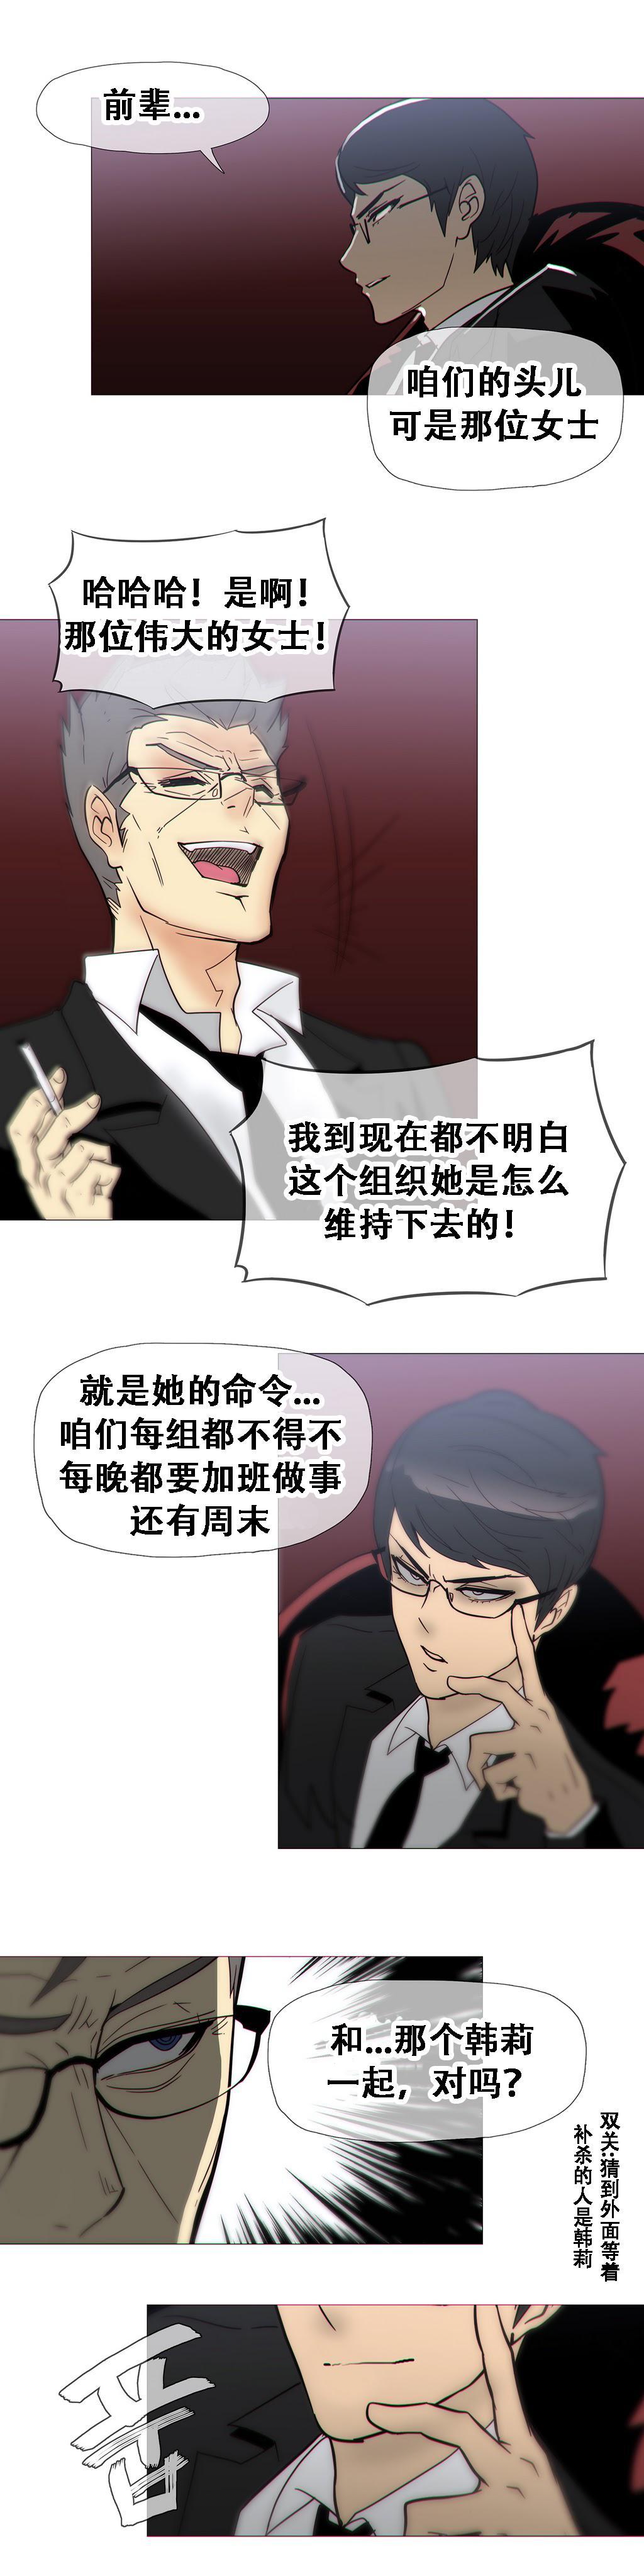 HouseHold Affairs 【卞赤鲤个人汉化】1~21话(持续更新中) 338